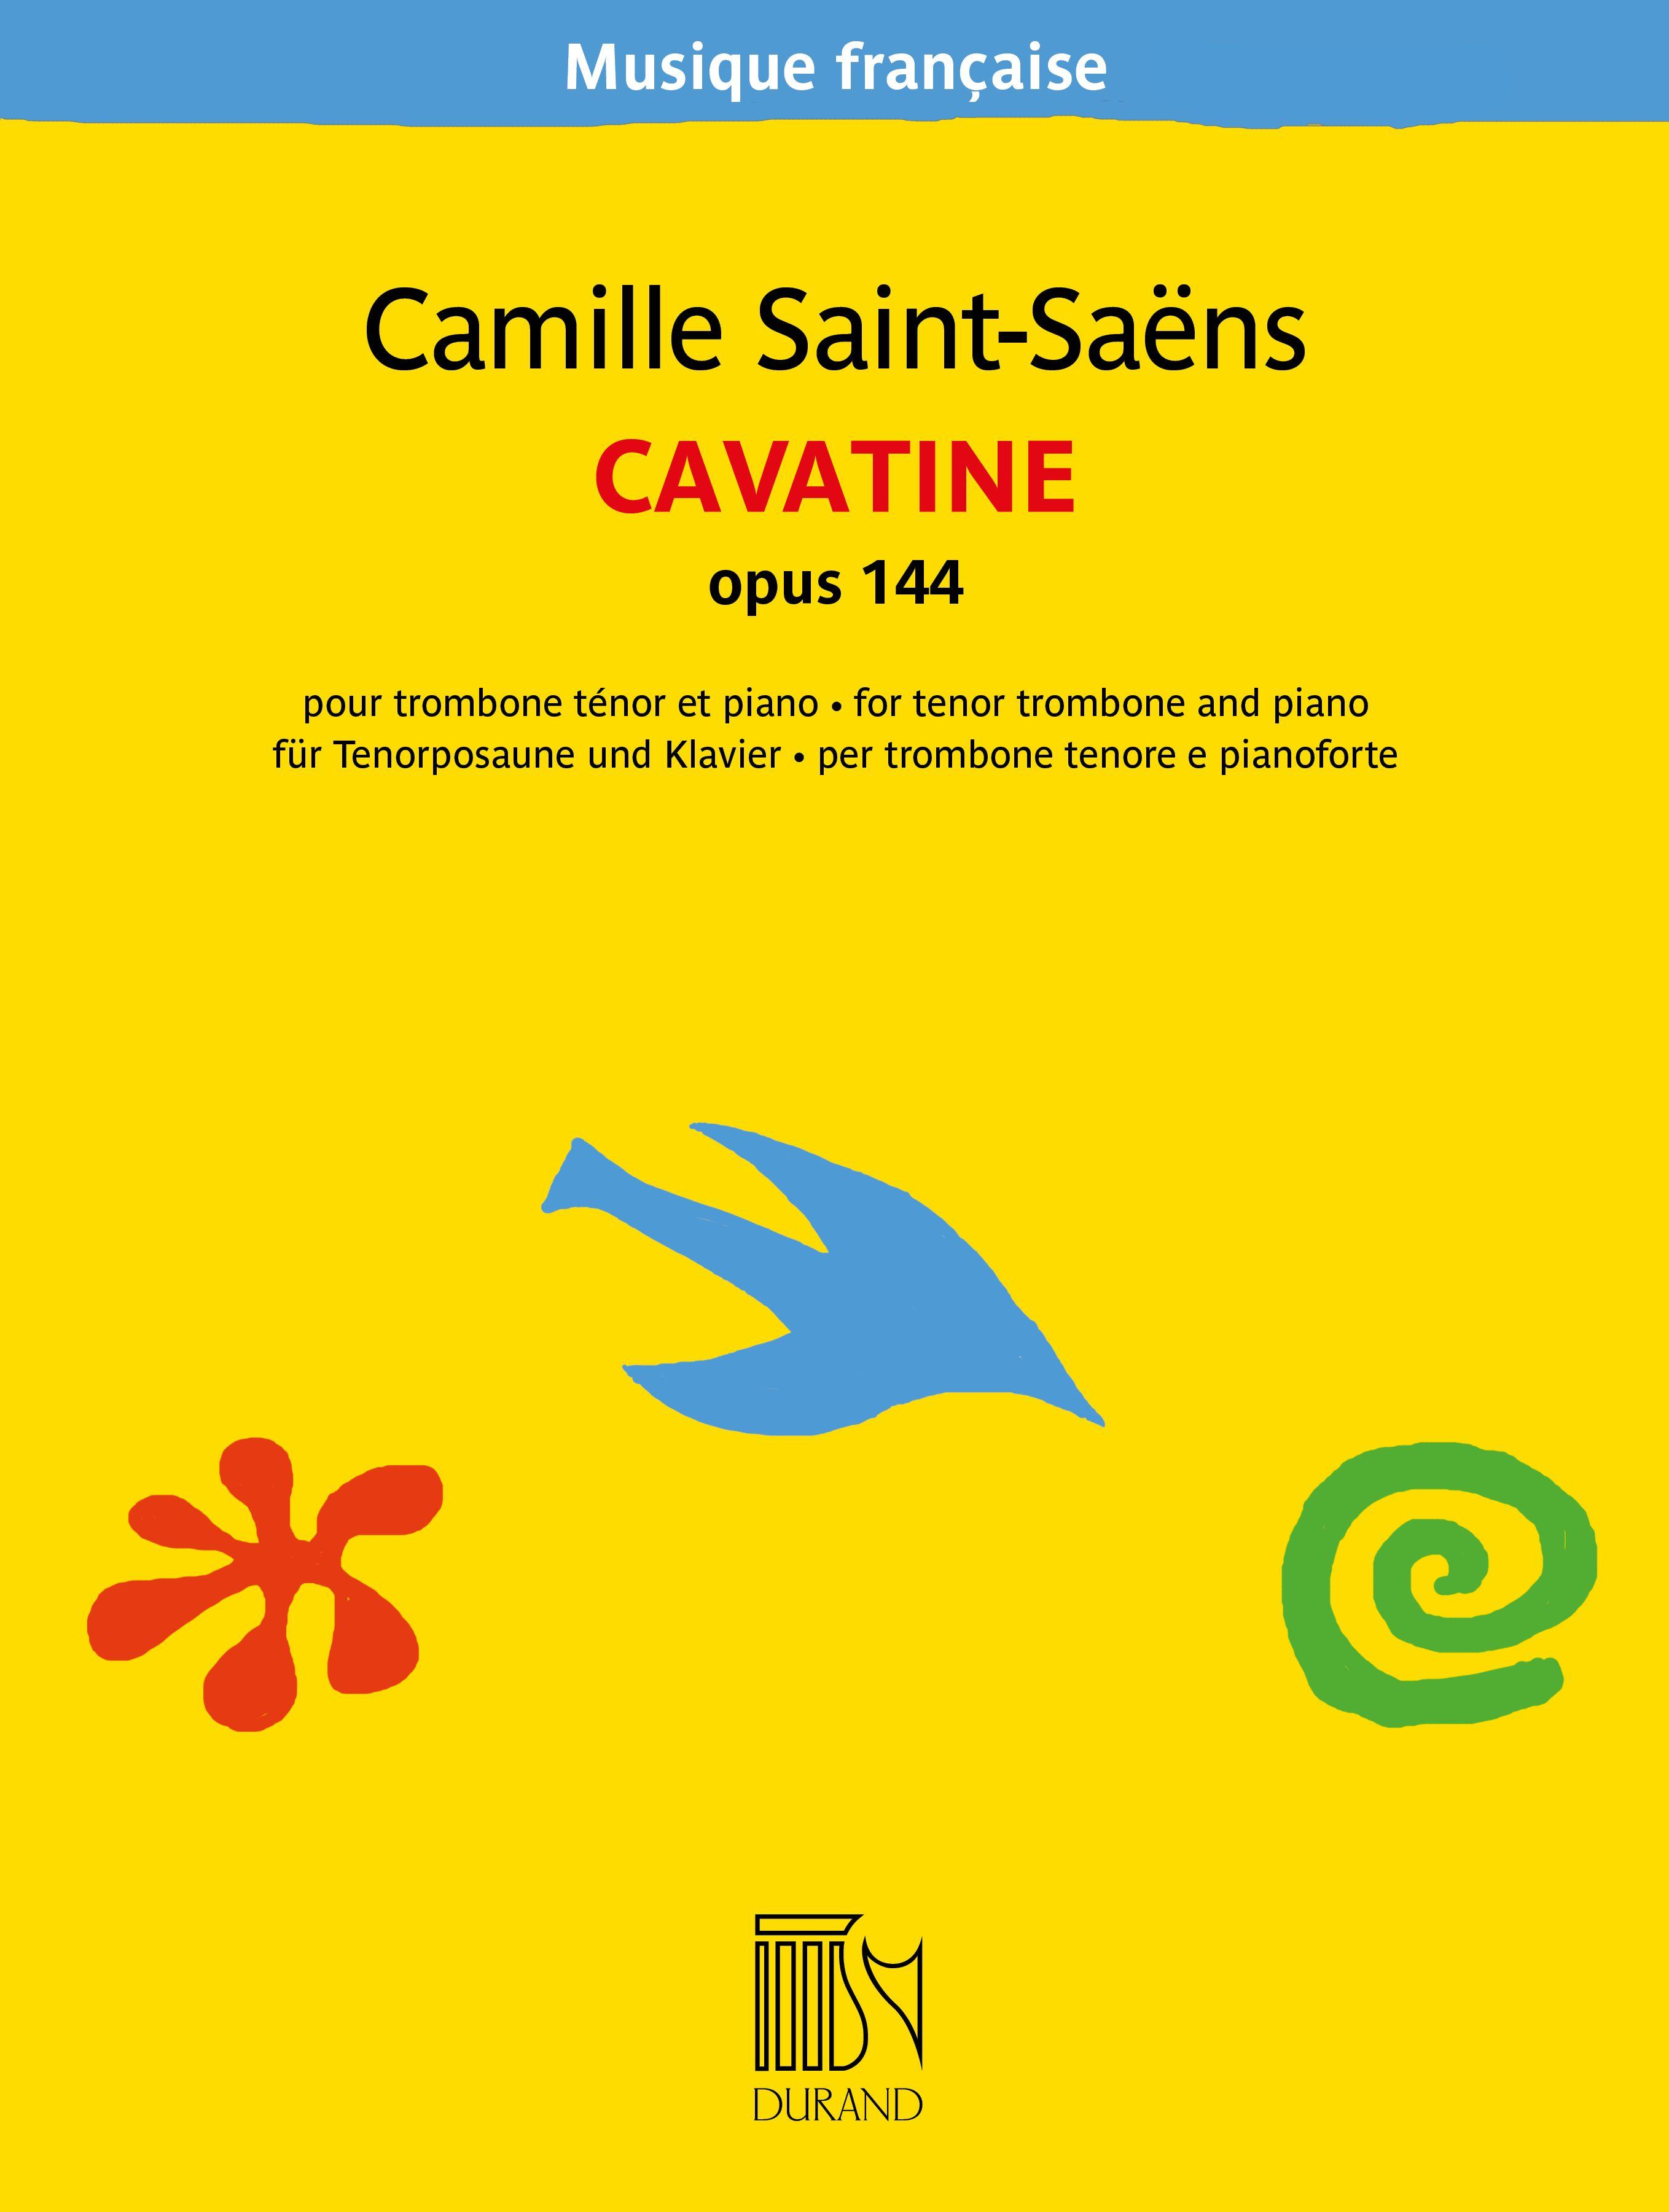 Camille Saint-Saëns: Cavatine opus 144: Trombone: Instrumental Work